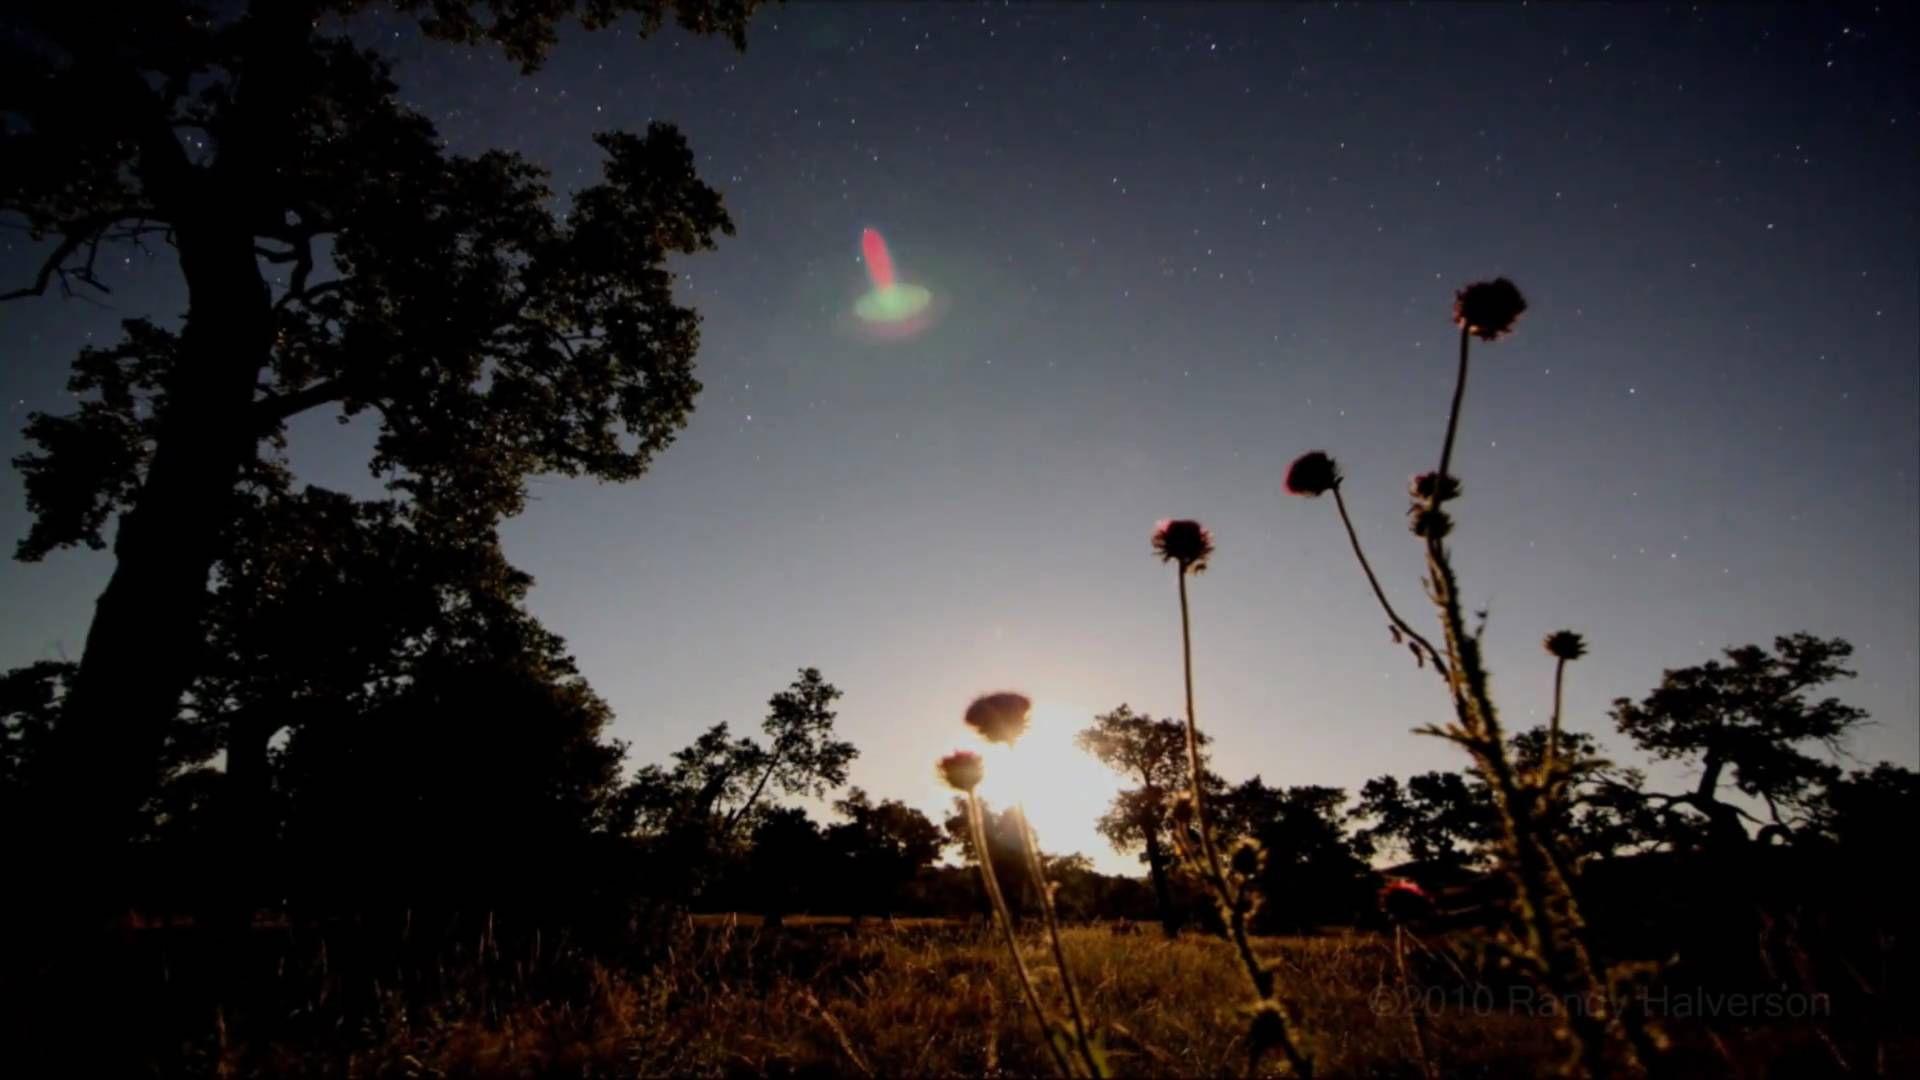 DakotaLapse - Night Timelapse - Volume 2